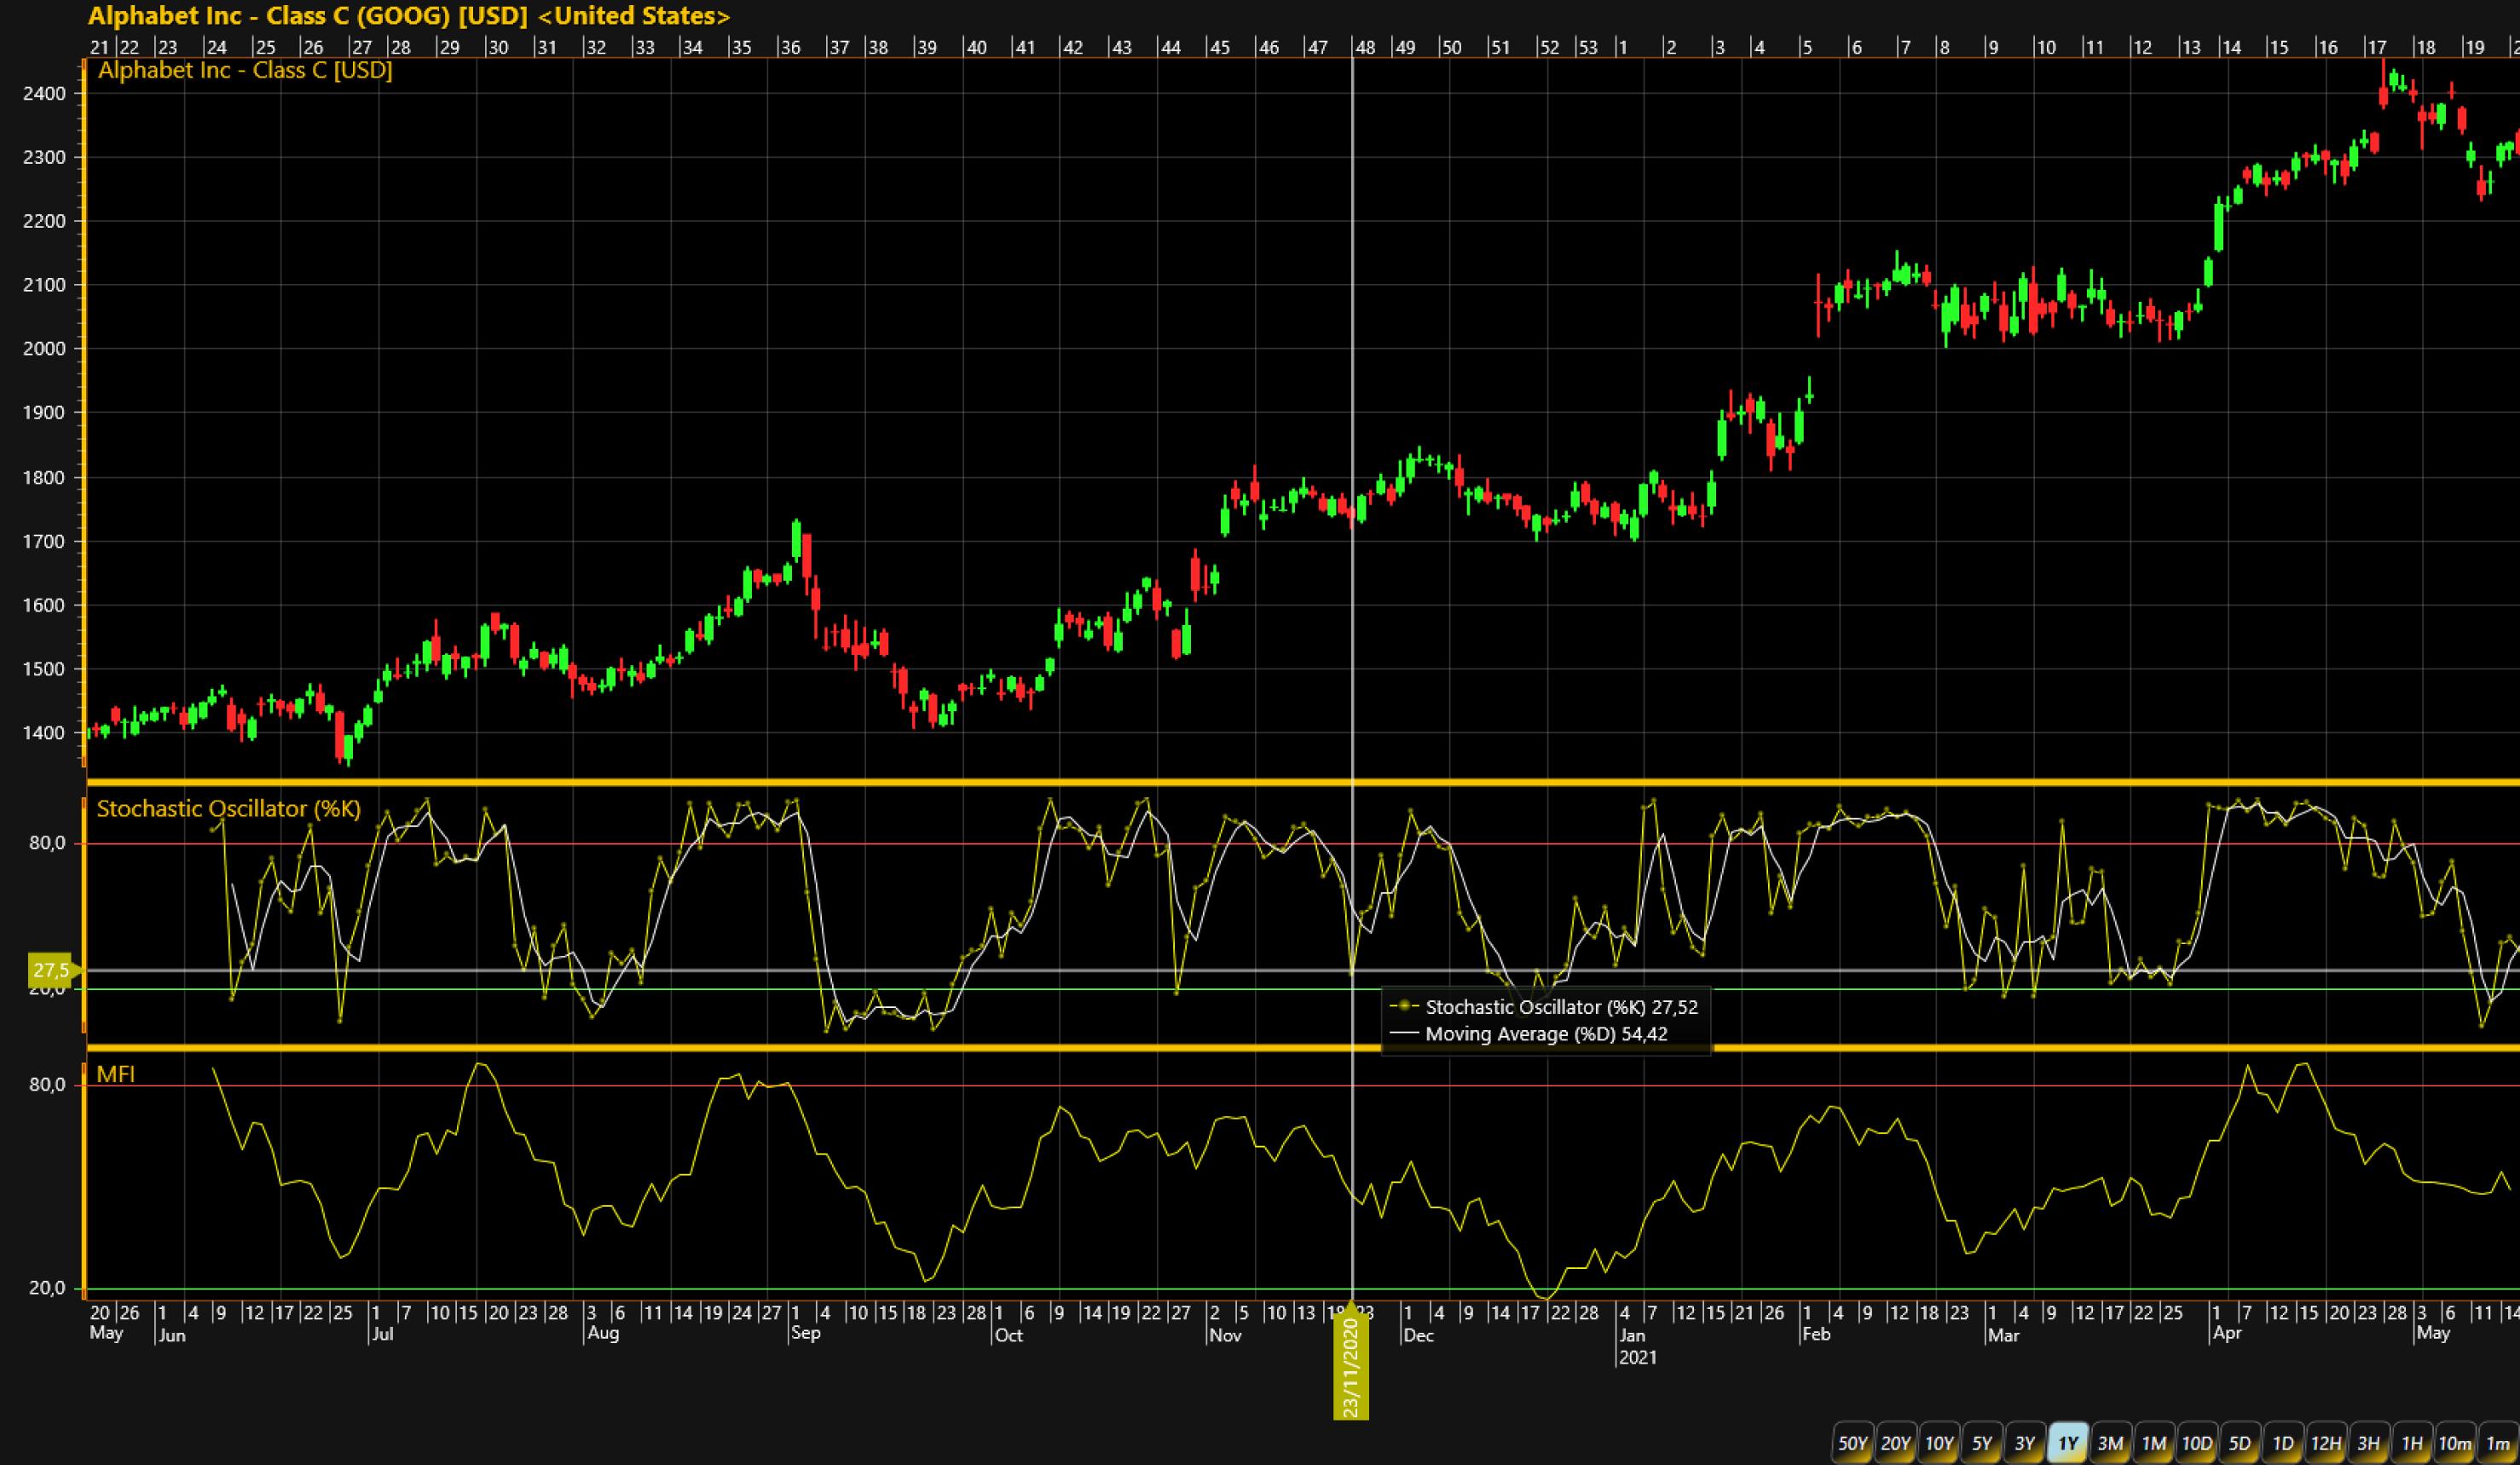 Stochastic-Oscillator-and-Money-Flow-Index-added-to-a-TradingChart-LightningChart-NET-version-10.1.1